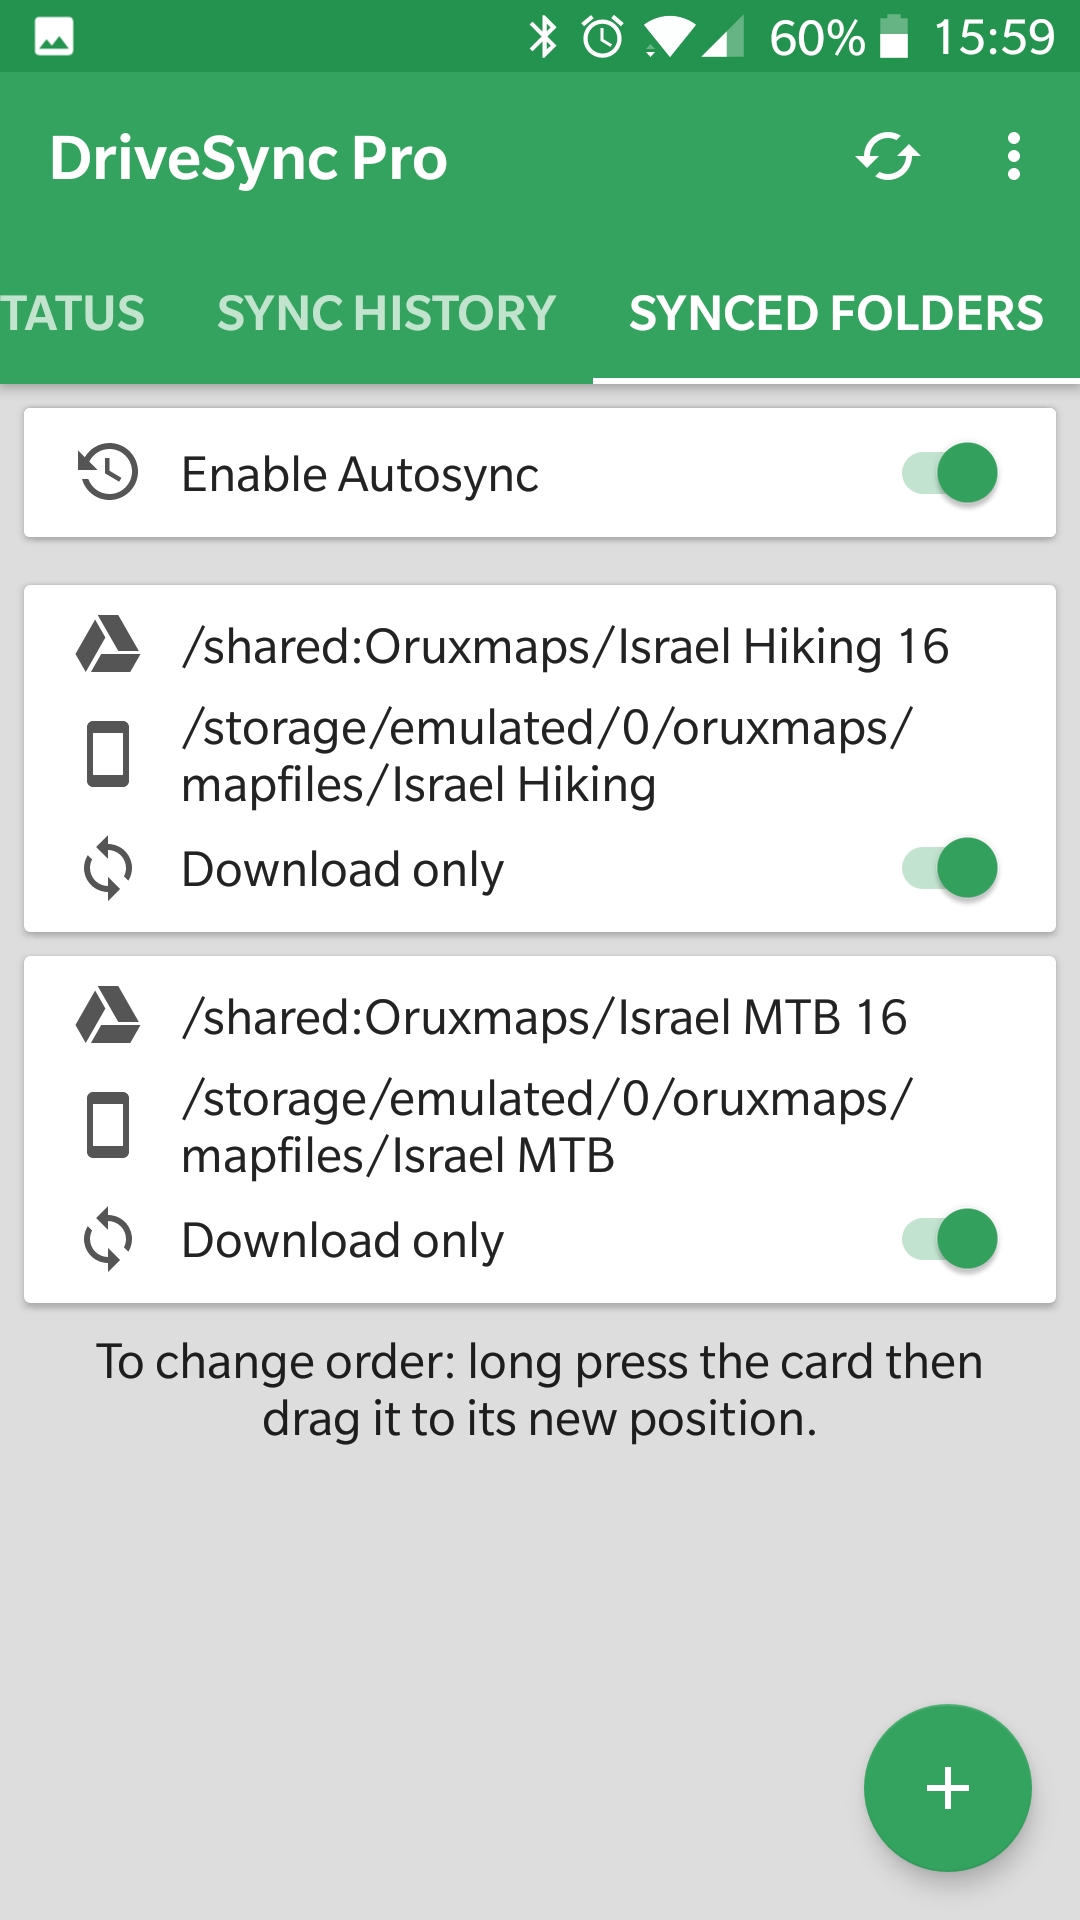 GitHub - IsraelHikingMap/Map: This repository holds the